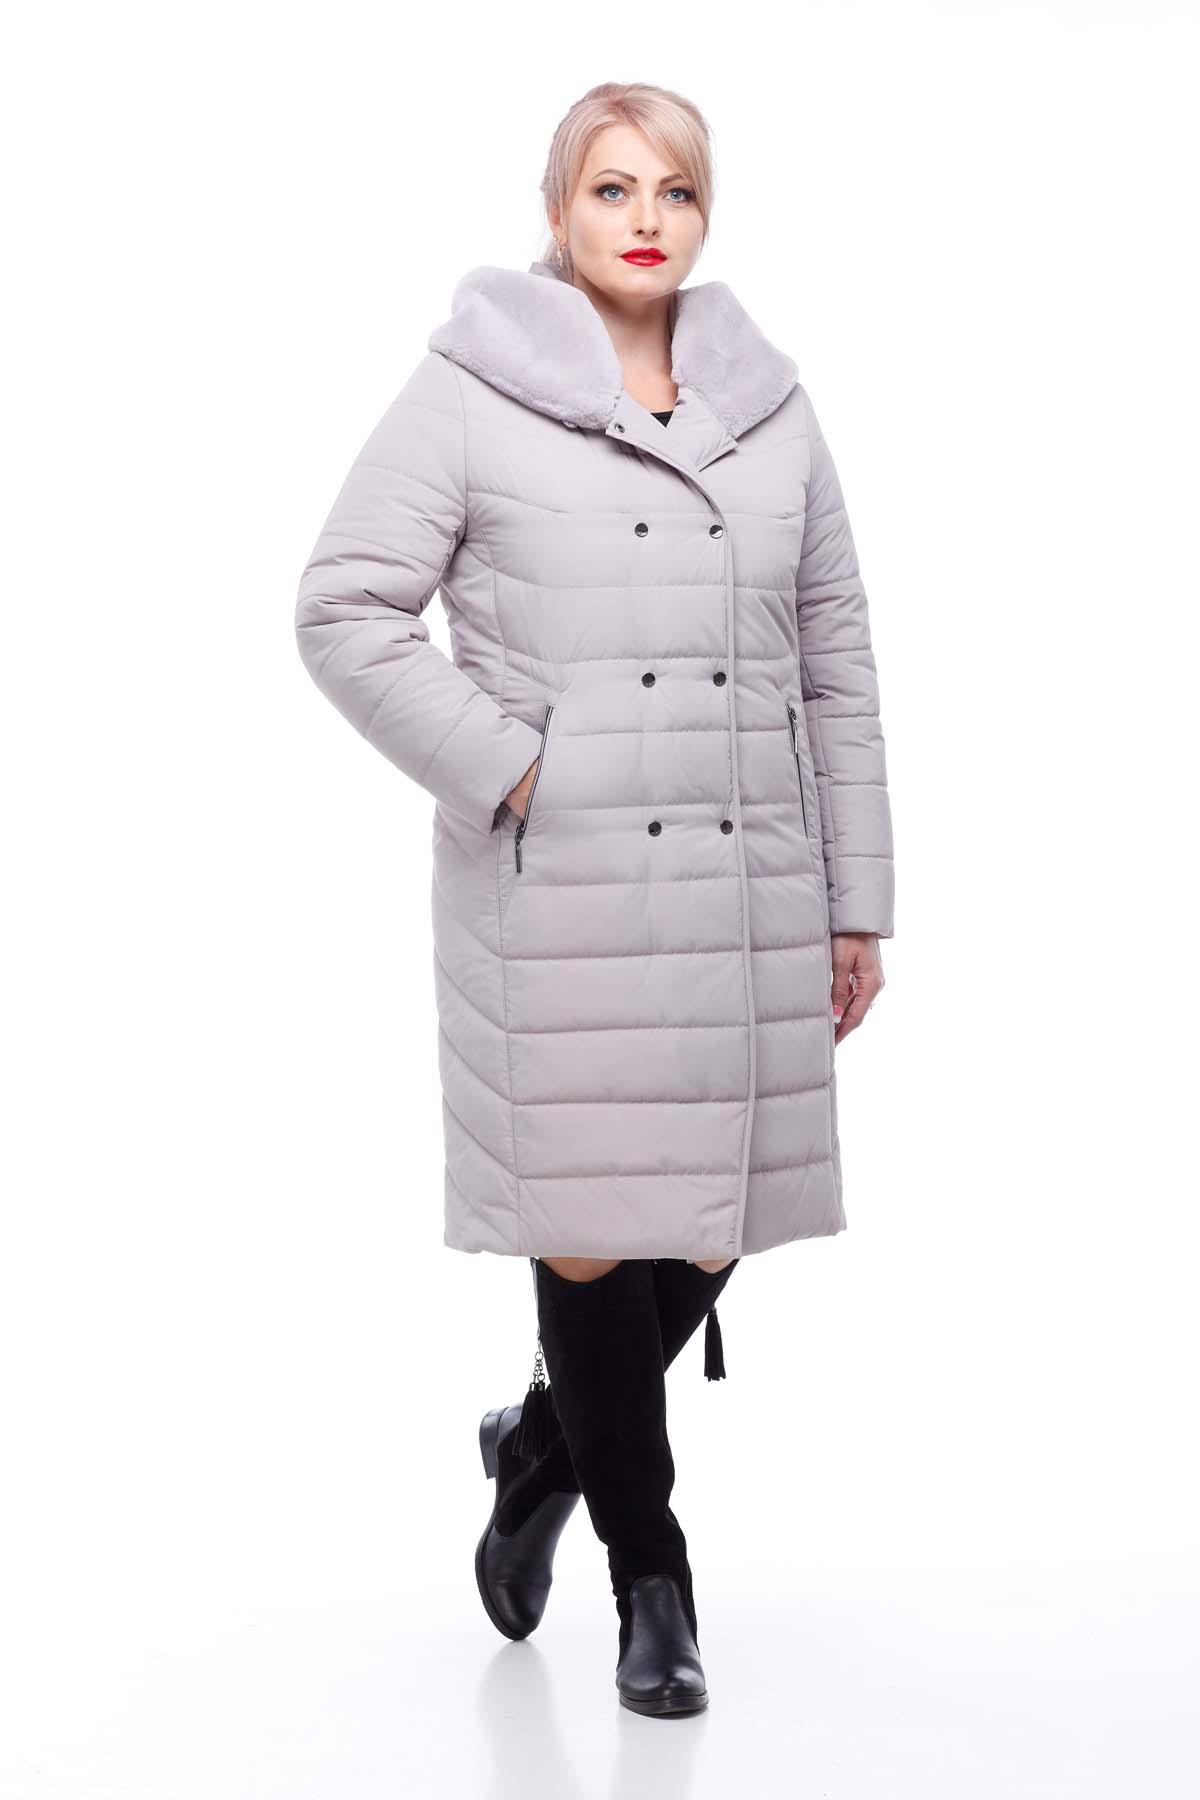 Зимове пальто стьогане Кім Зима, кролик лаванда